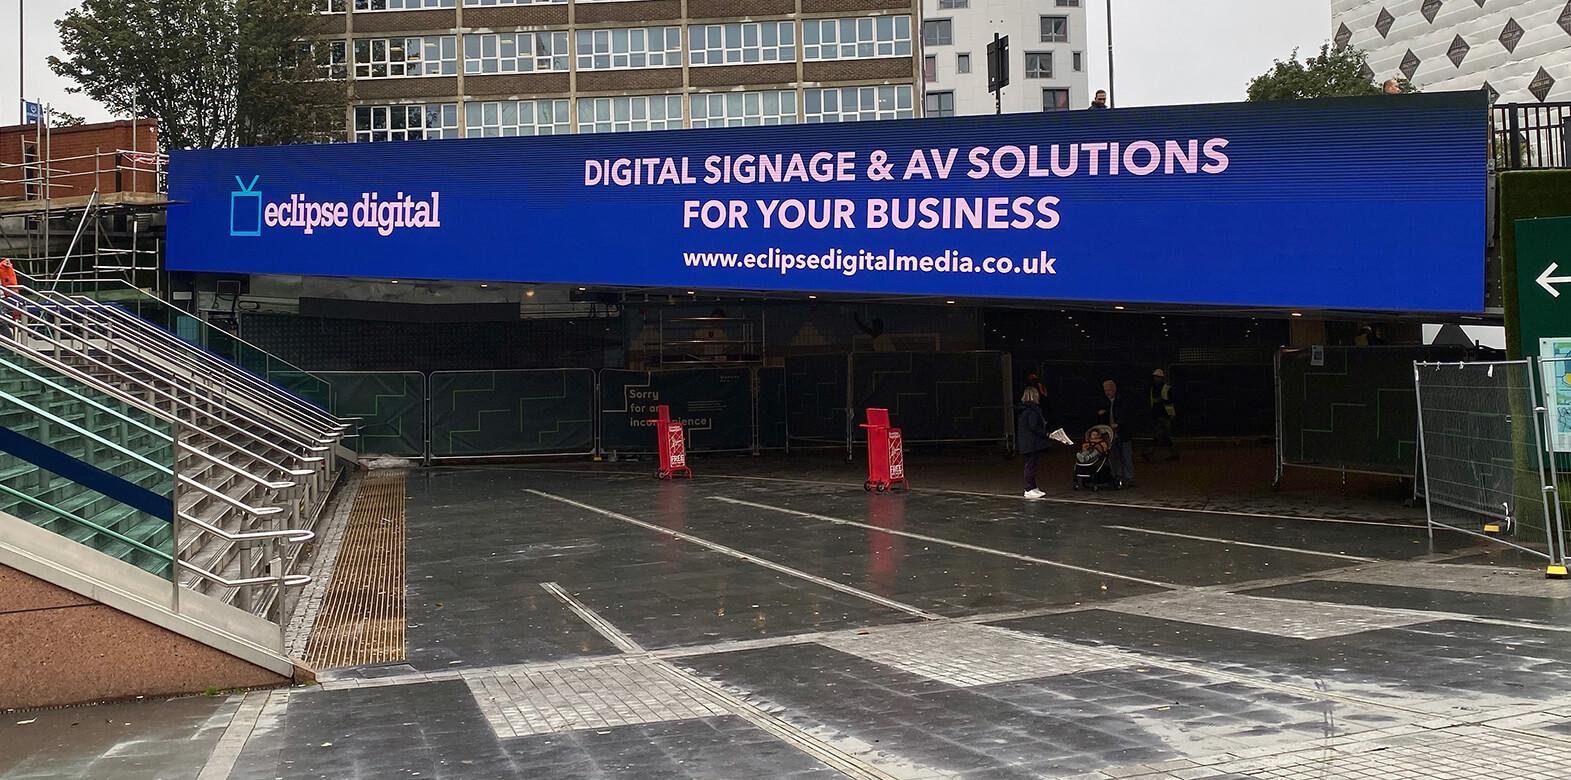 Eclipse Digital Media - Digital Signage and AV Solutions - Wembley Park - Bobby Moore Bridge LED - Eclipse Digital